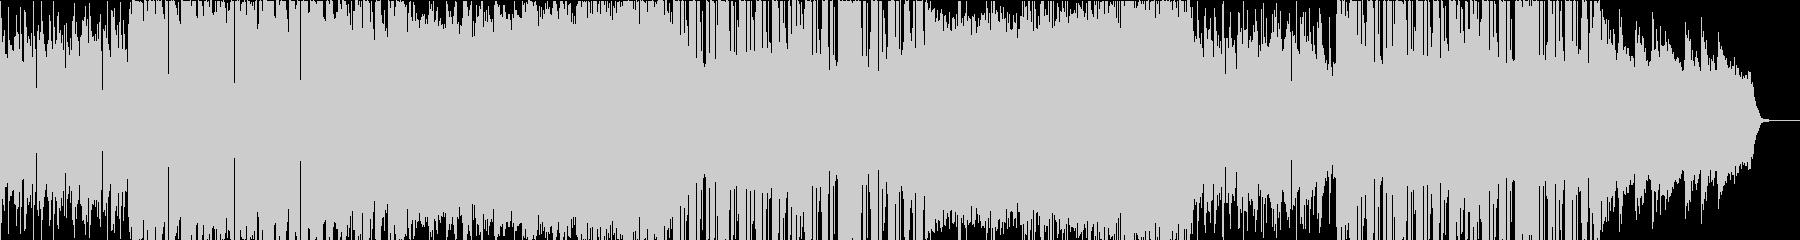 【BGM】メロウなLo-fiポップス の未再生の波形